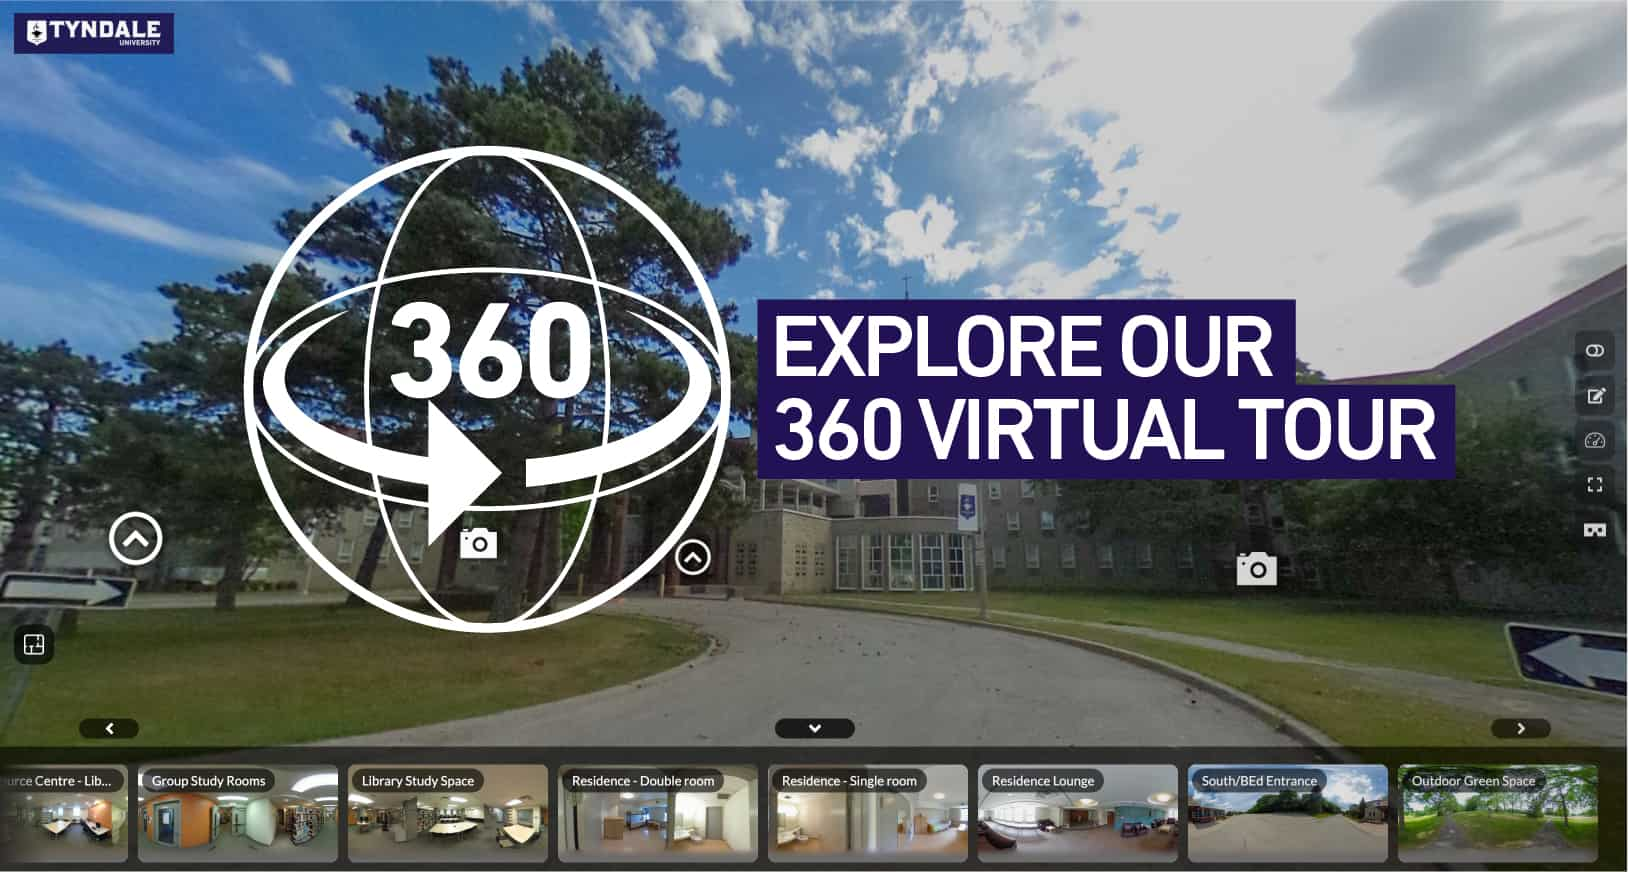 Explore our 360 virtual tour